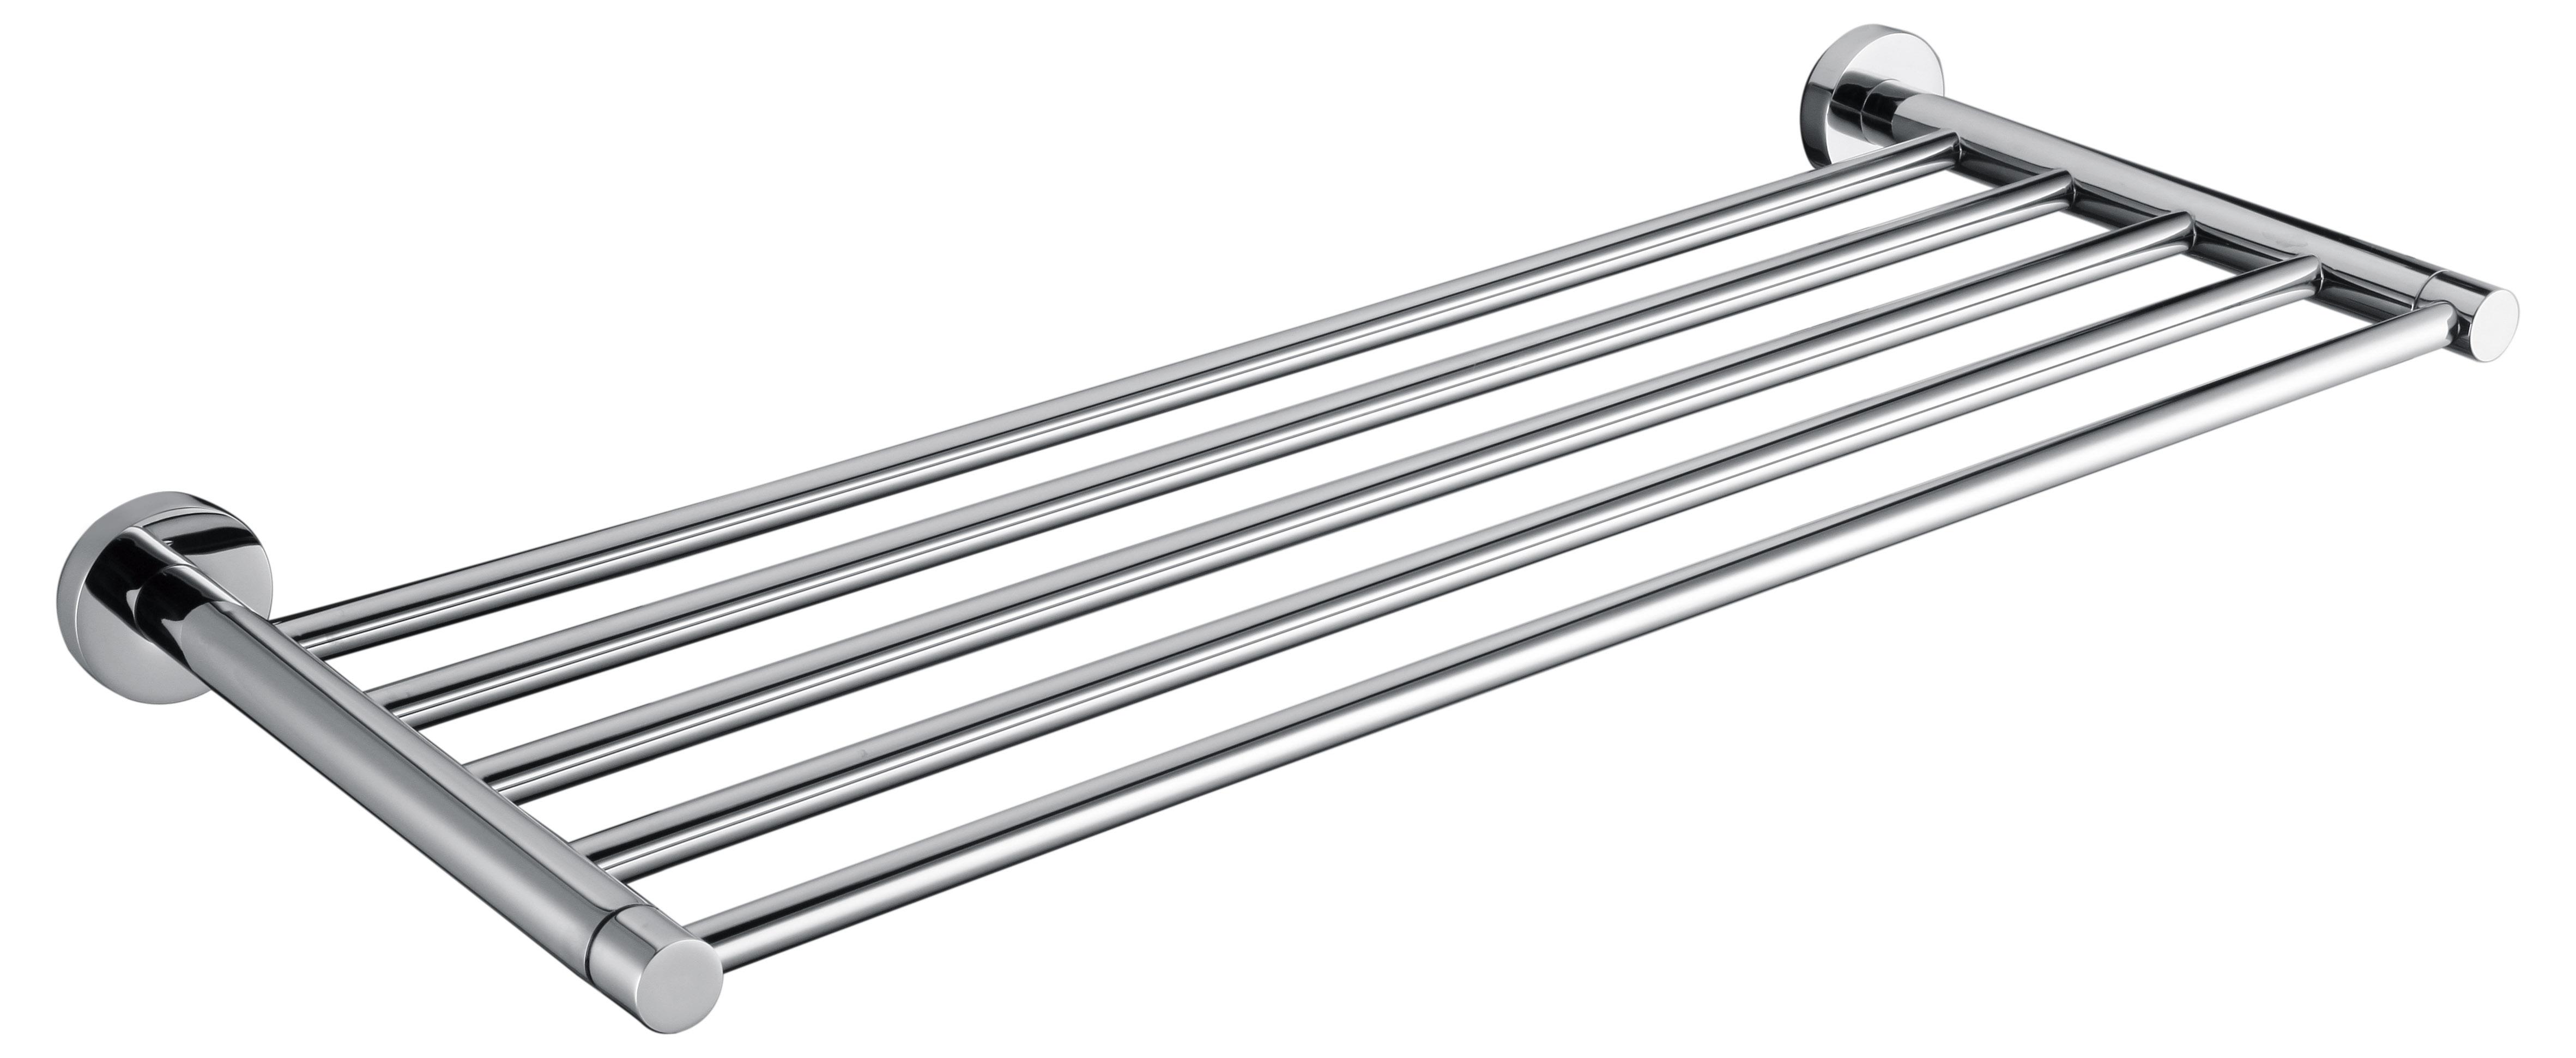 Bathroom Shelf Towel Rail Rack Bar Holder  Z2320